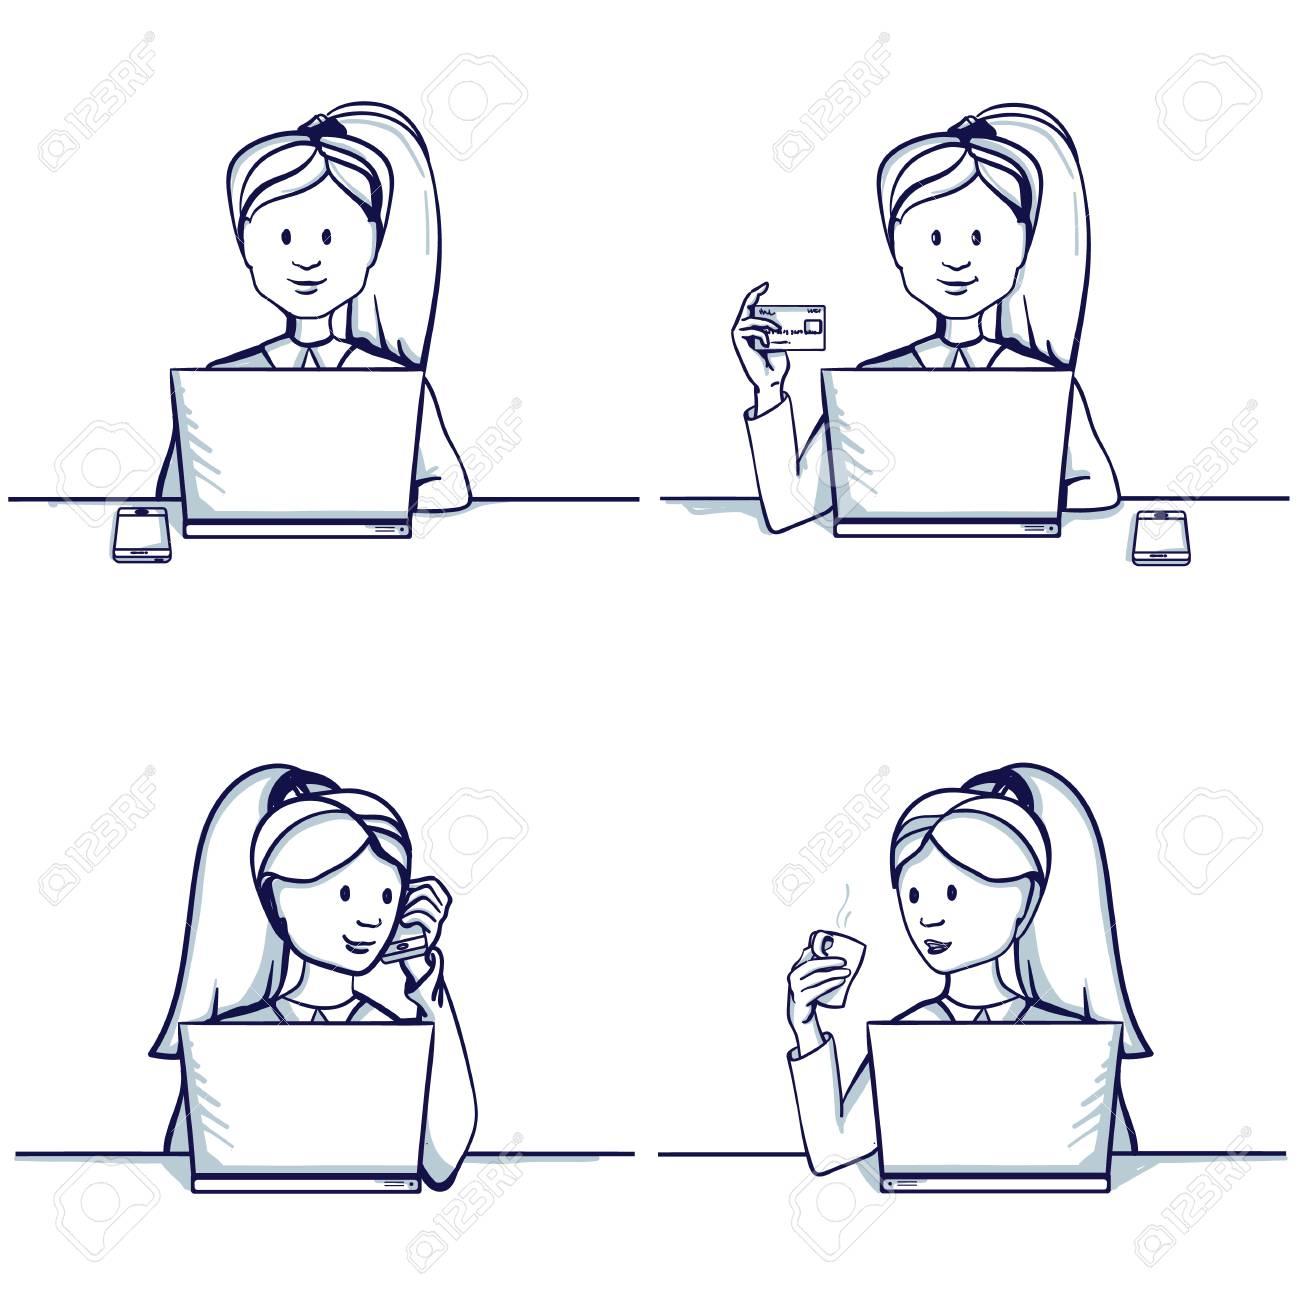 set of business woman cartoon illustration sitting scenes business